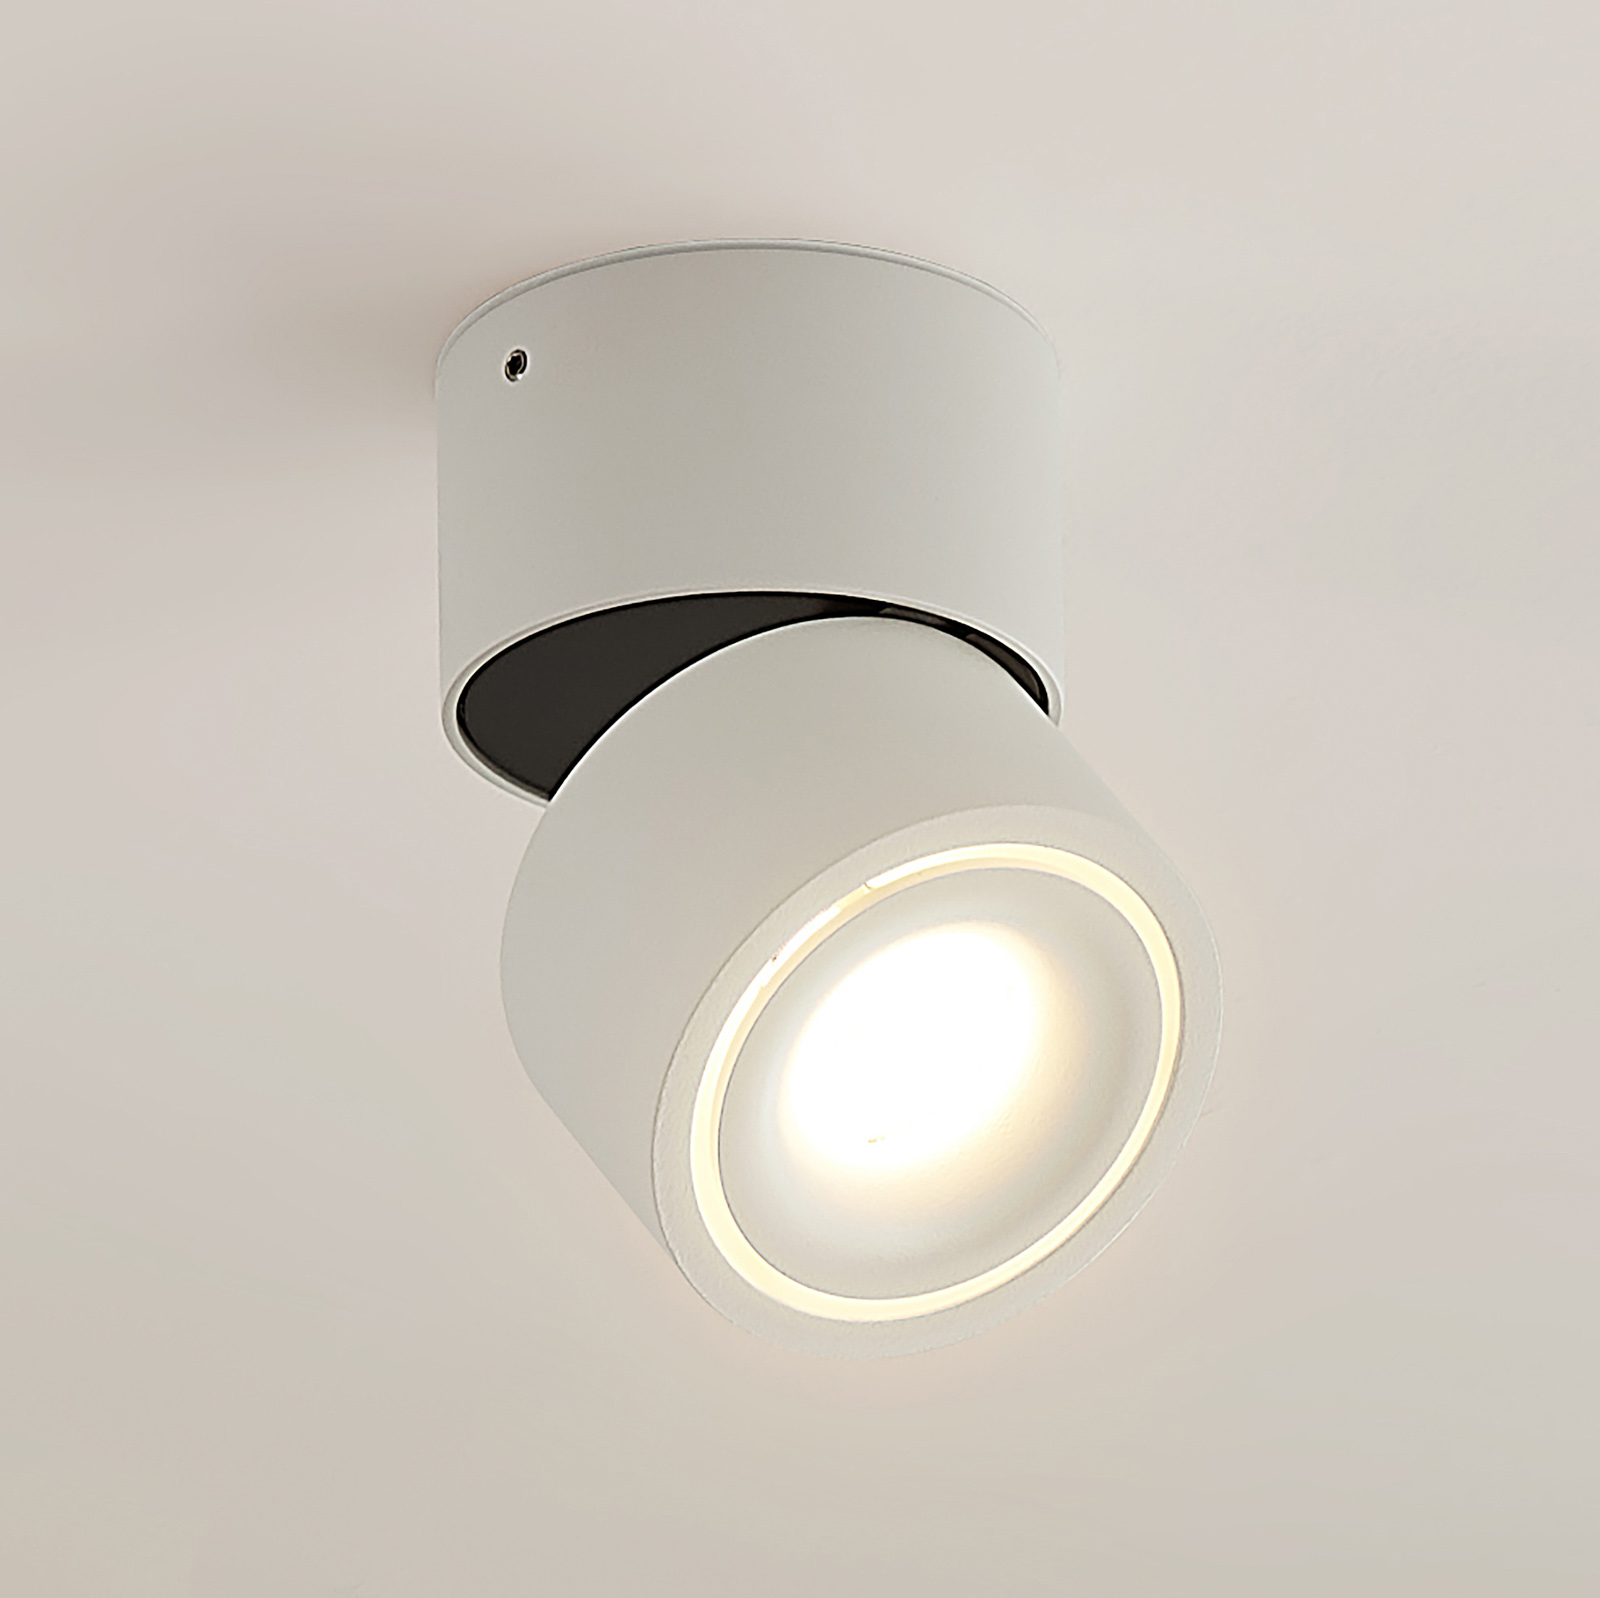 Arcchio Rotari LED-Deckenstrahler 1-flammig 6,1W